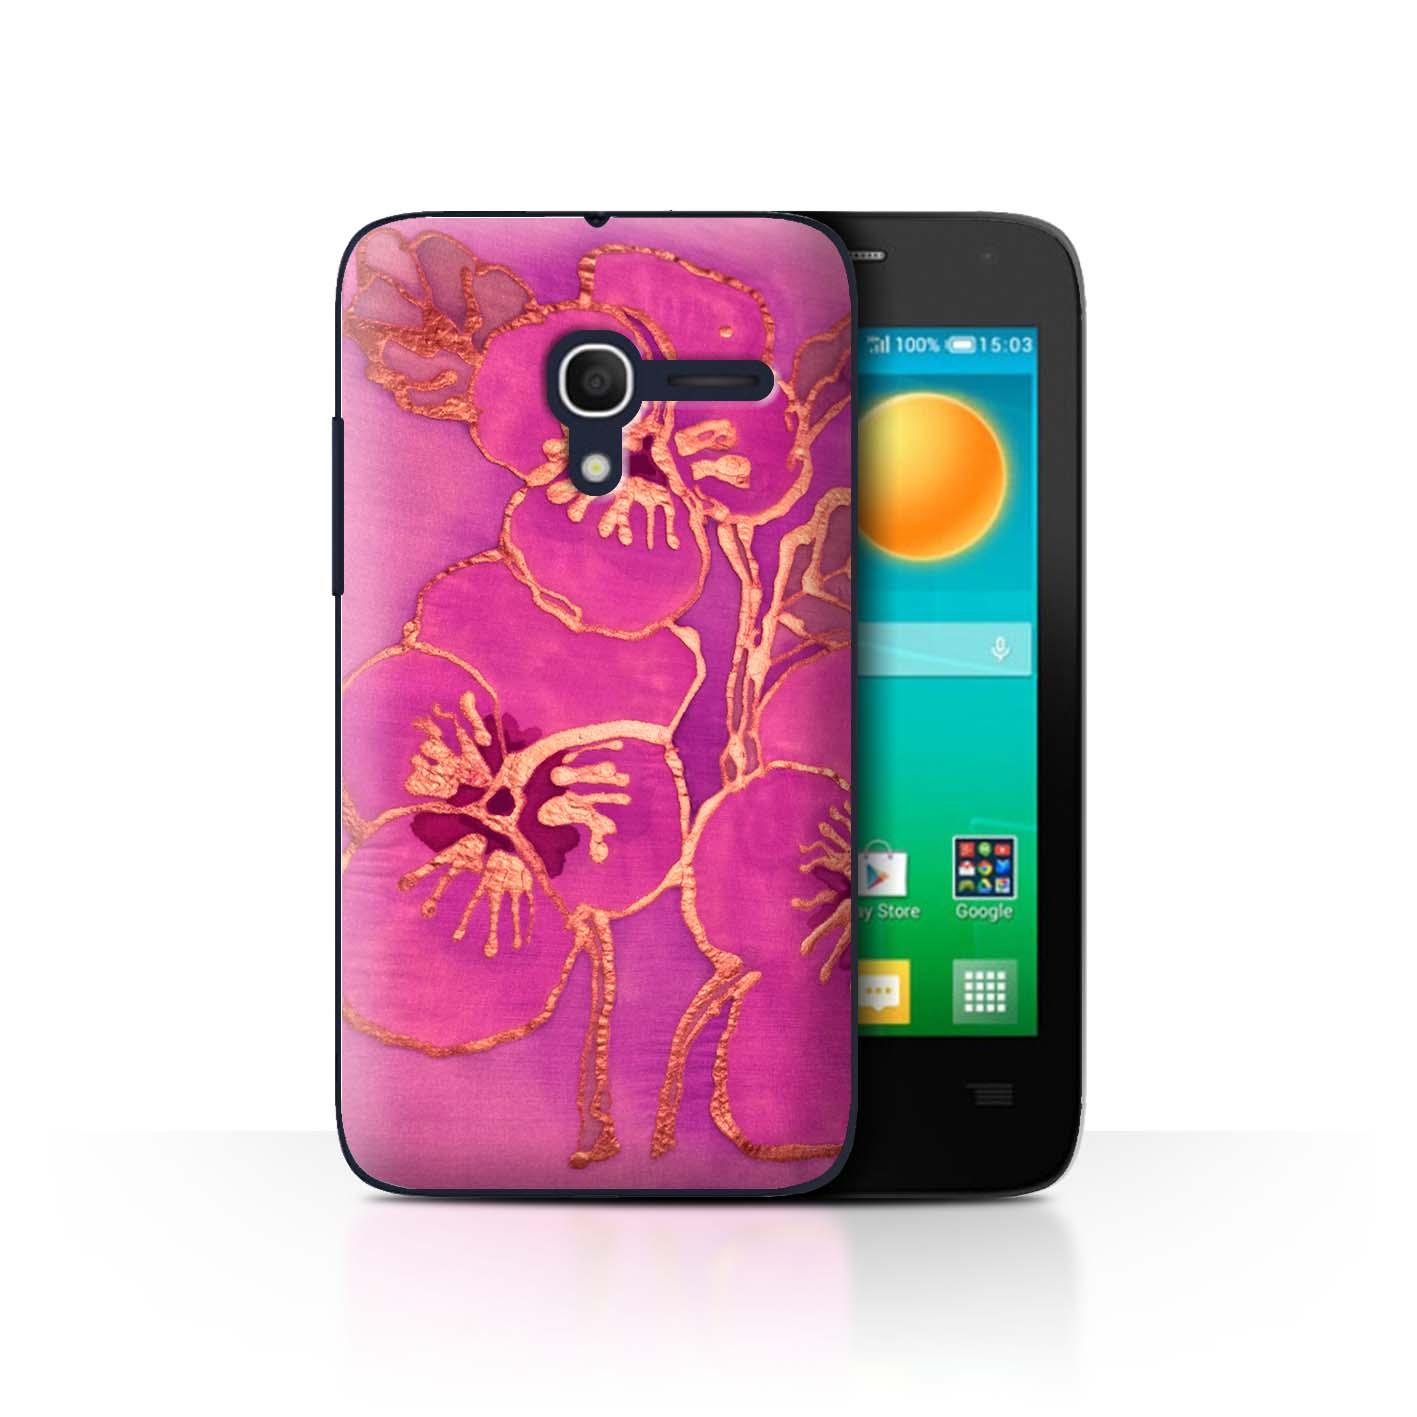 STUFF4-Back-Case-Cover-Skin-for-Alcatel-Pop-D3-Floral-Silk-Effect